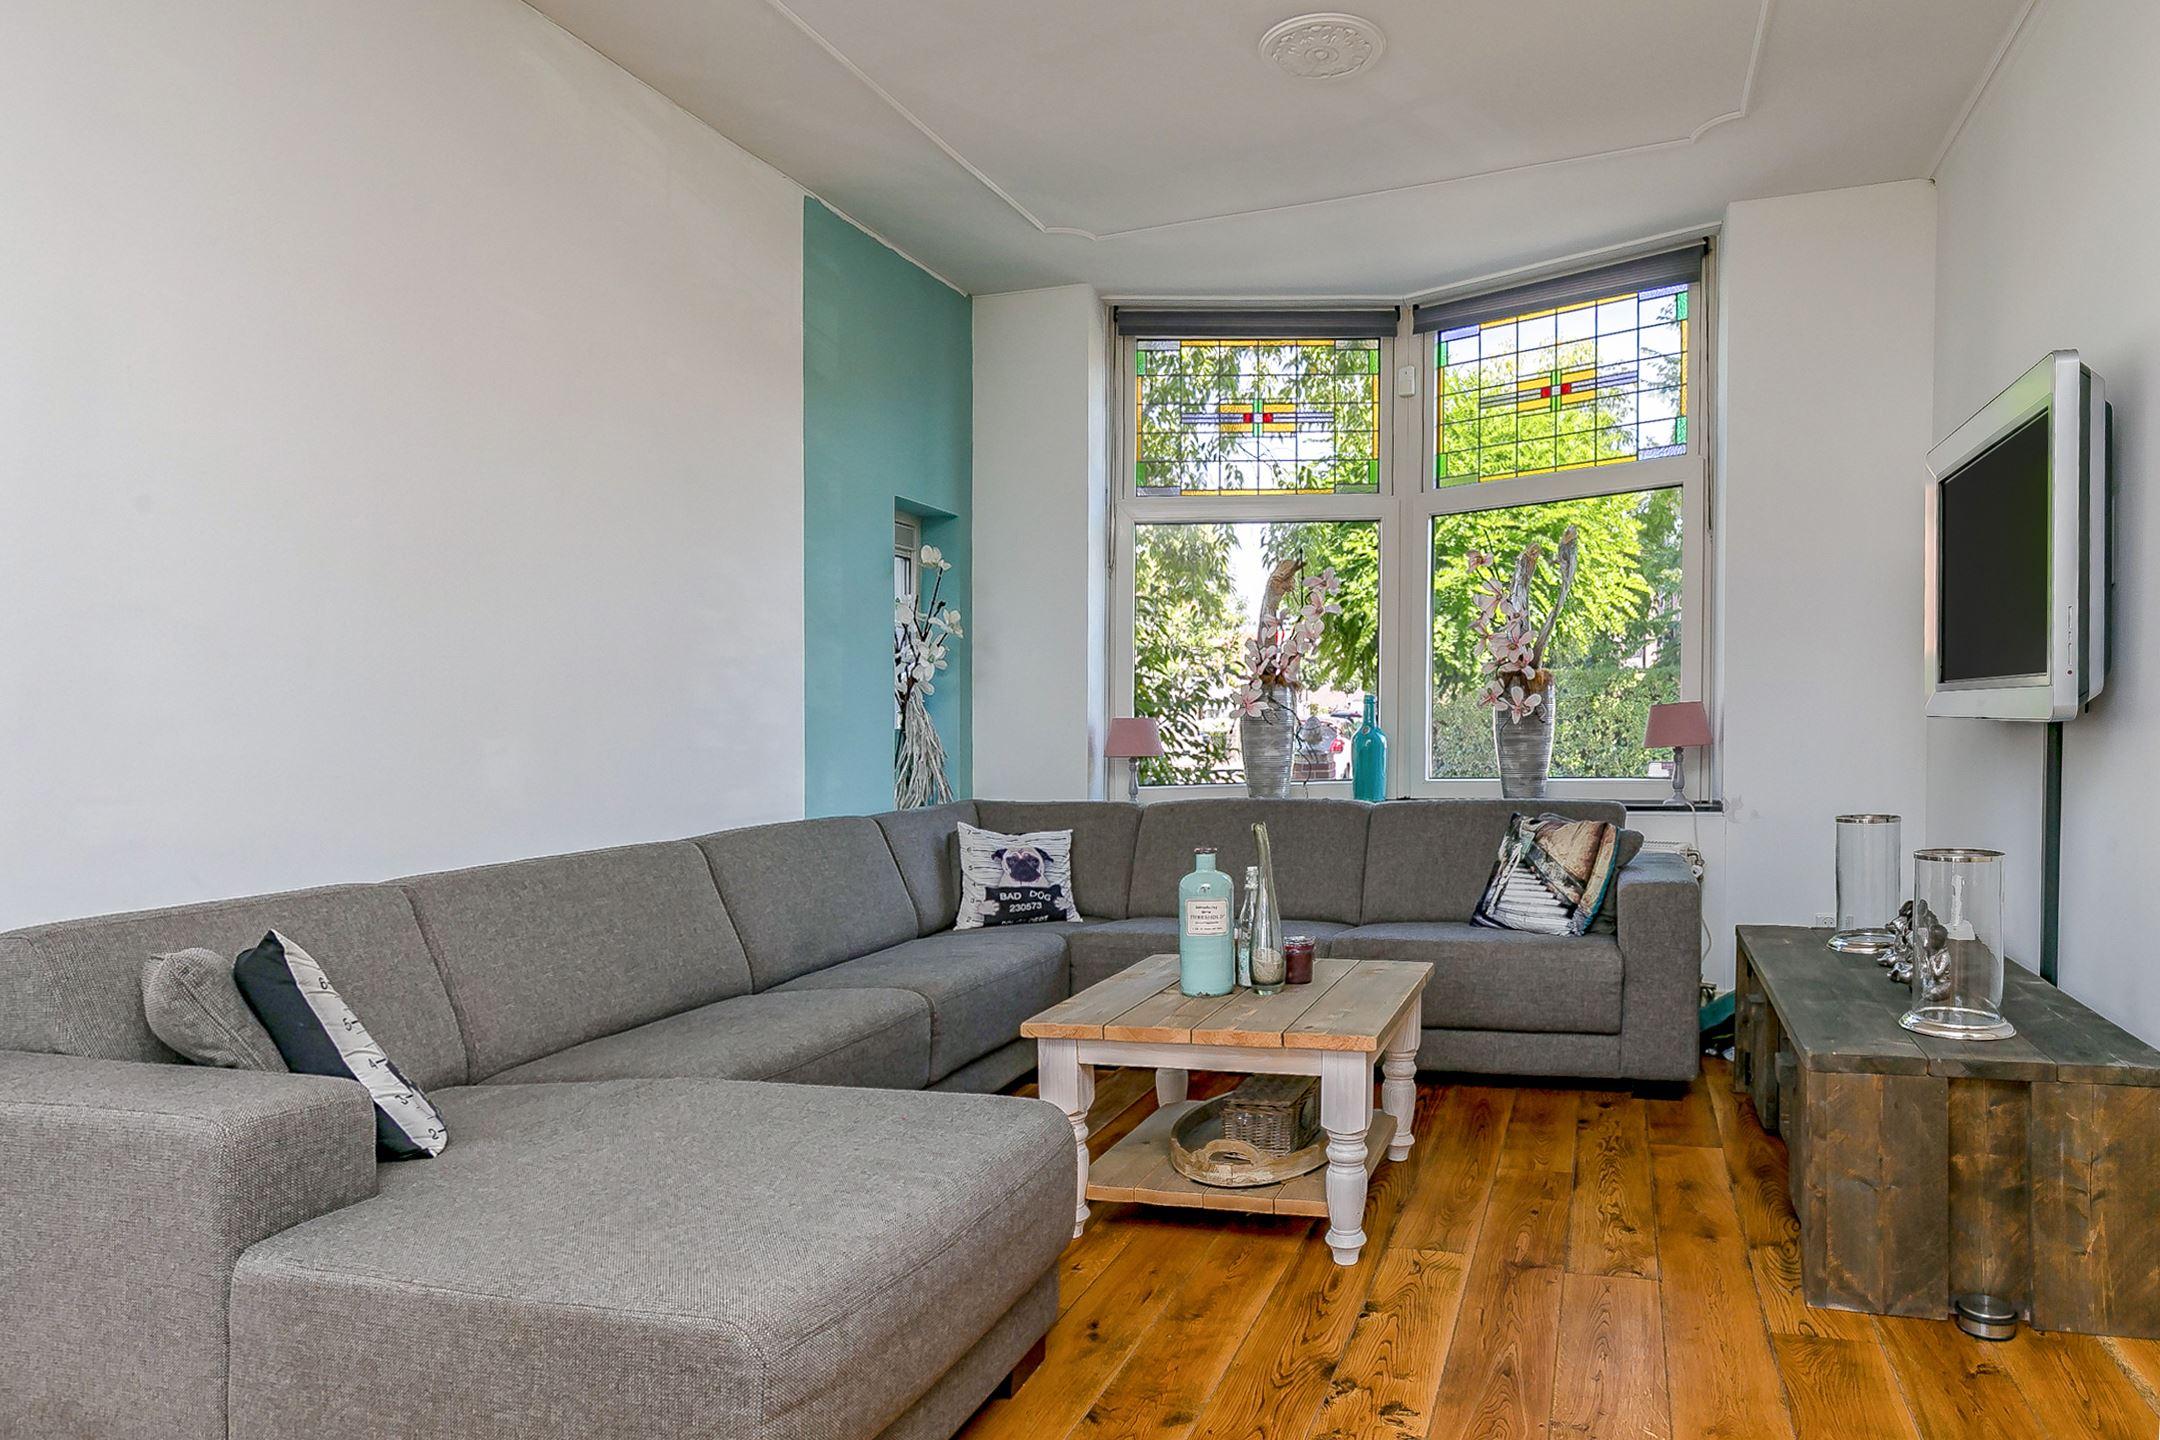 Huis te koop asterstraat hb vlaardingen funda